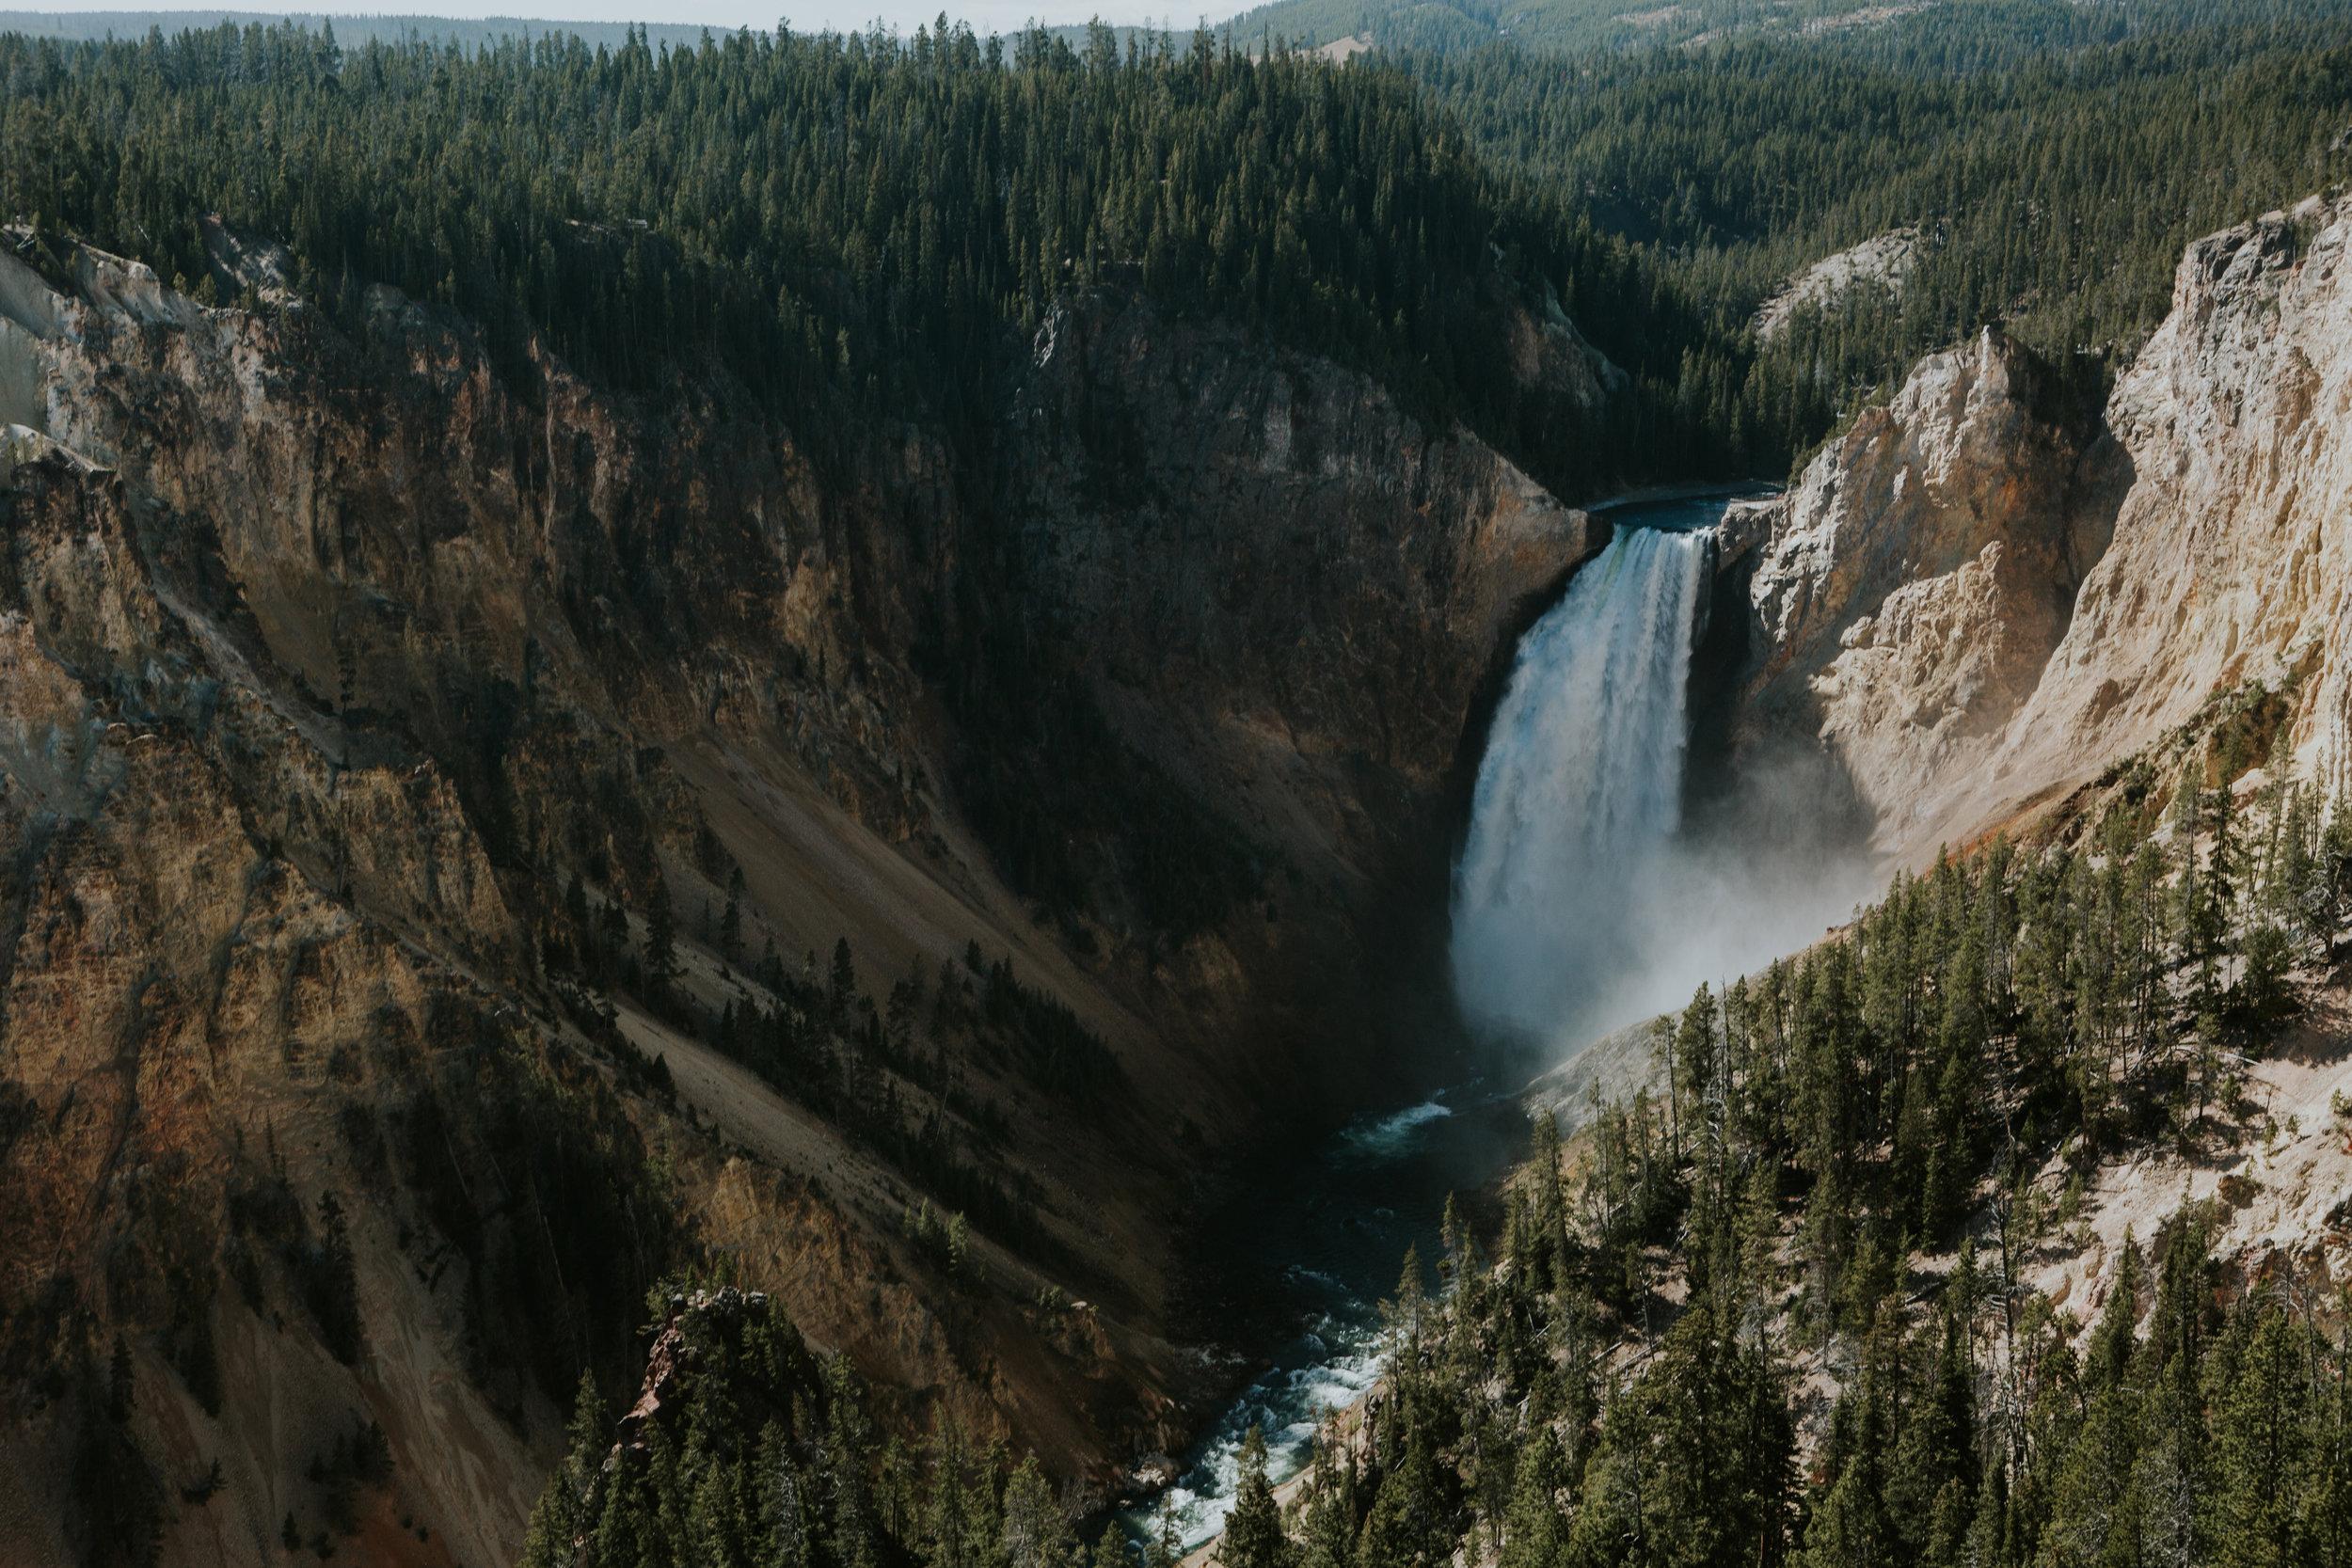 CindyGiovagnoli_outdoor_adventure_photography_Grand_Teton_Yellowstone_Glacier_National_Park_Montana_Wyoming_South_Dakota_Mount_Rushmore_Badlands-014.jpg